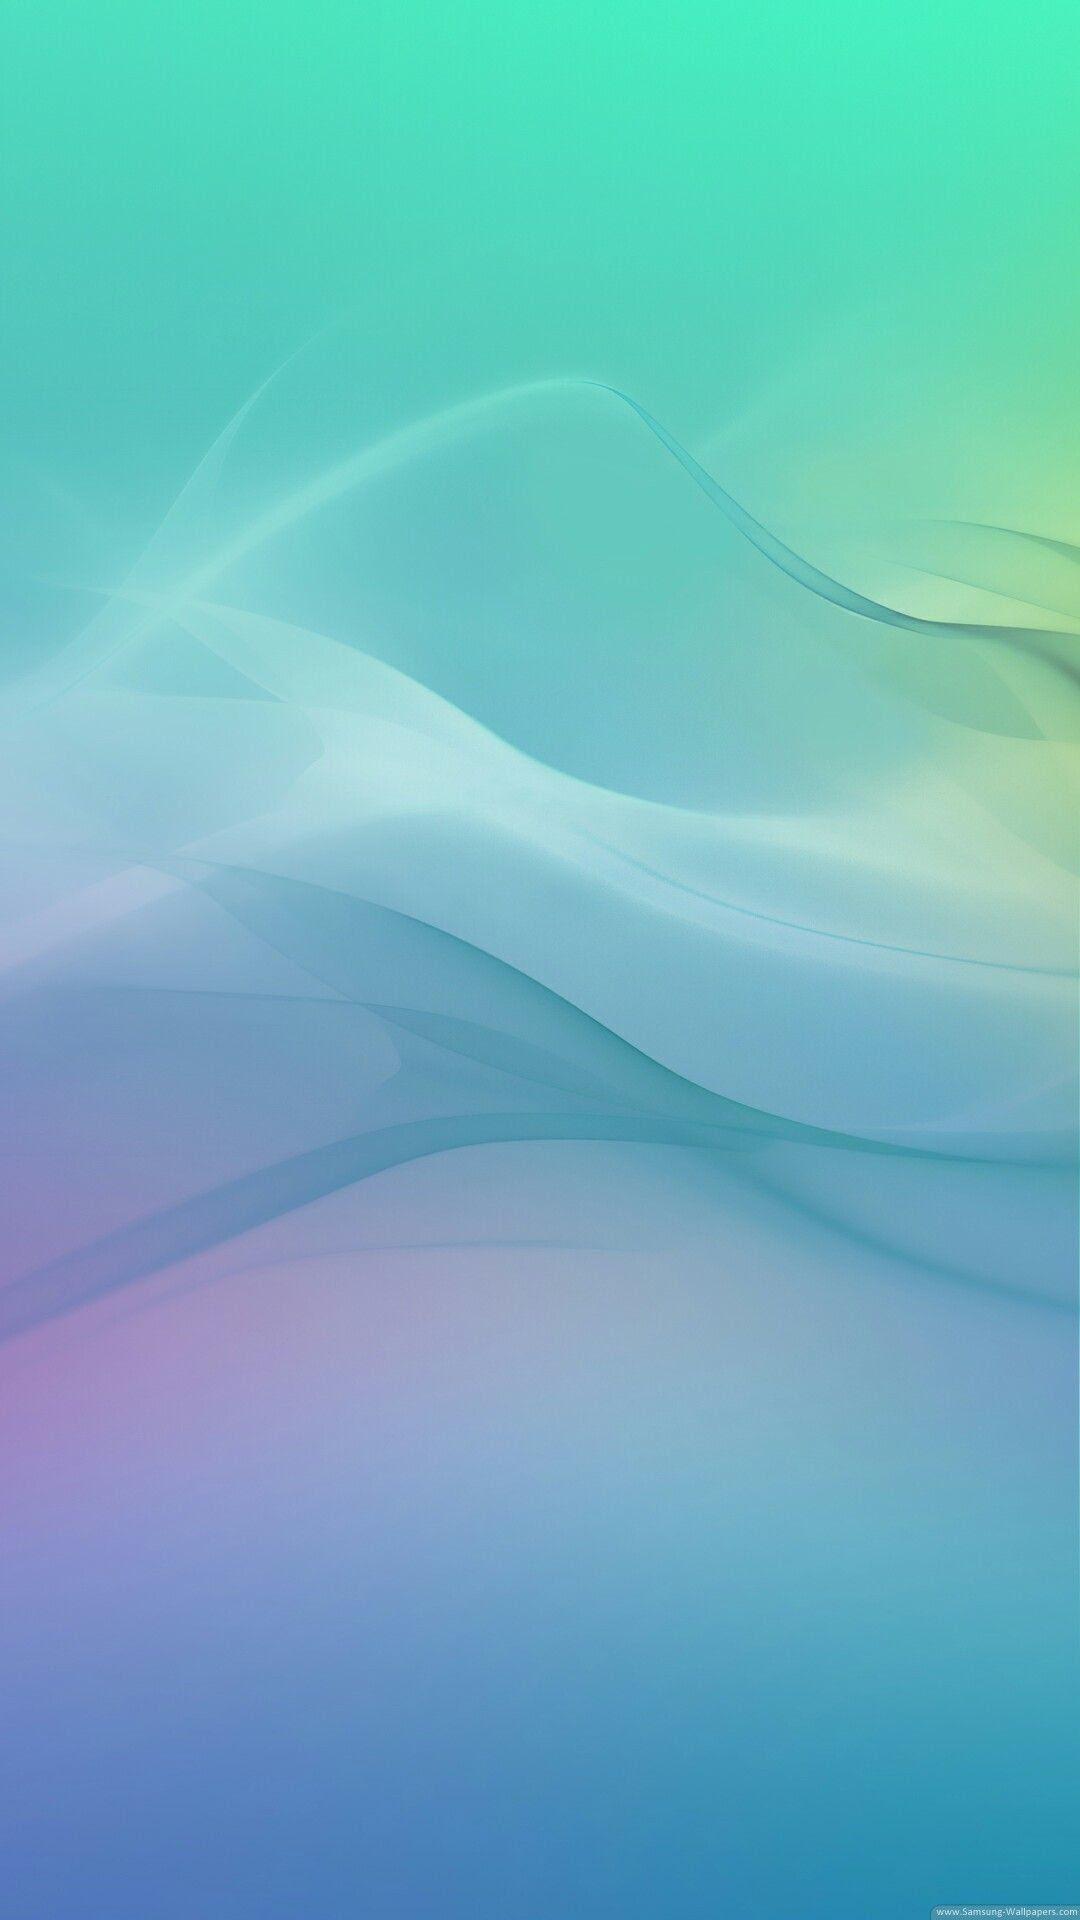 Unduh 900 Wallpaper Hd For Samsung